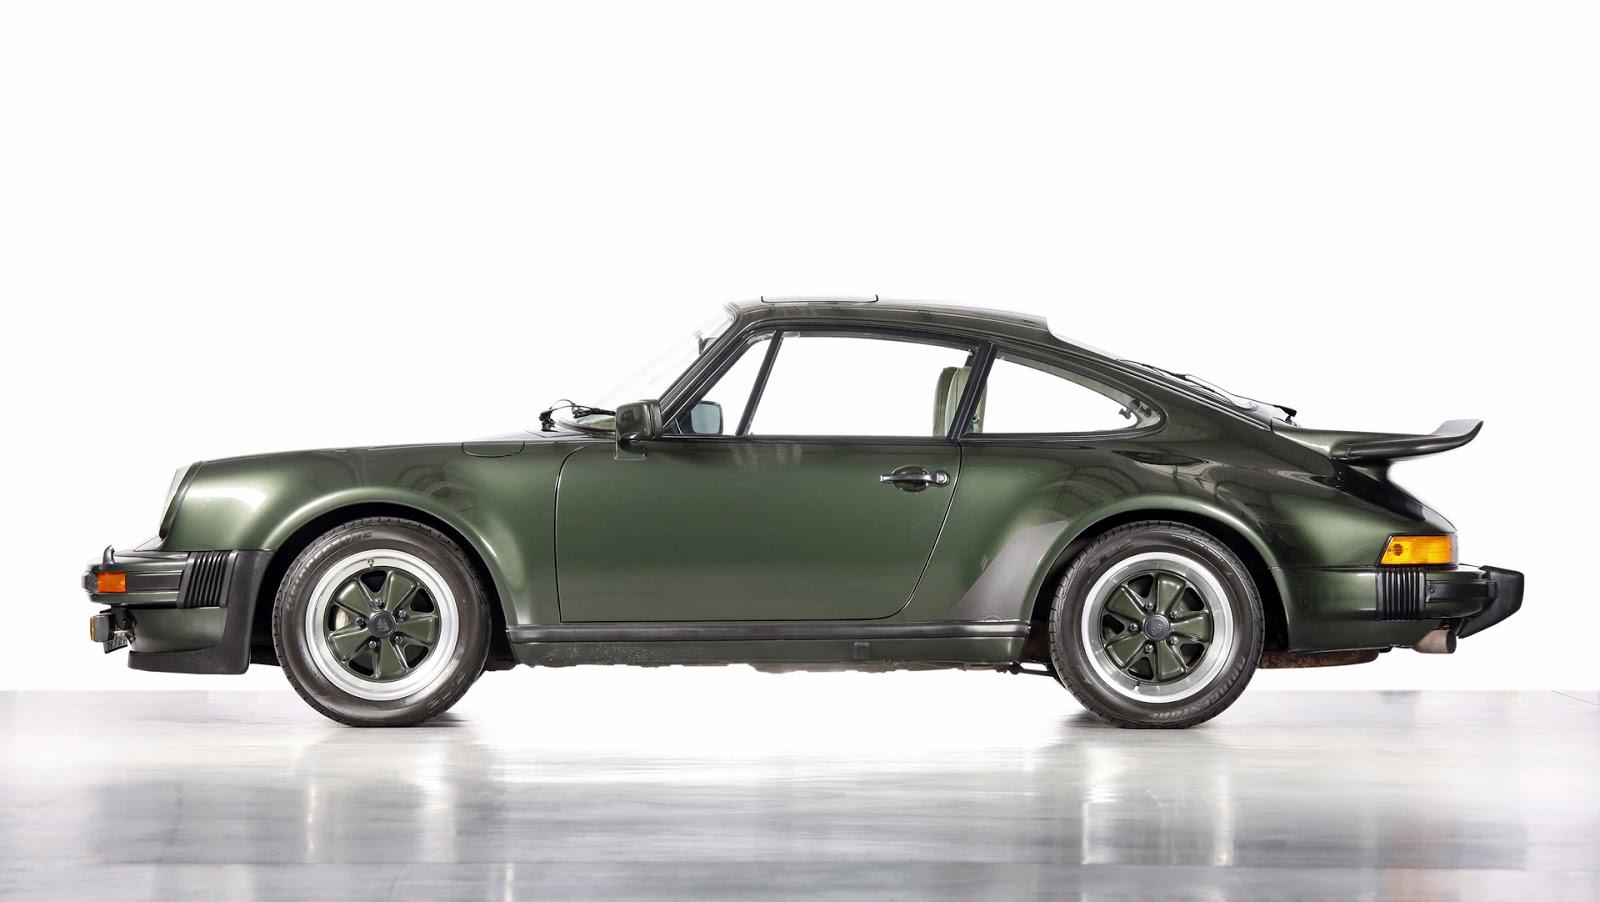 911 turbo 1973 porsche ag 1 Τα 7 super sport αυτοκίνητα της Porsche απο το 1953 μέχρι σήμερα Classic, Porsche, Porsche 550 Spyder, Porsche 904 Carrera GTS, Porsche 911 GT1, Porsche 911 Turbo, Porsche 918 Spyder, Porsche 959, Porsche Carrera GT